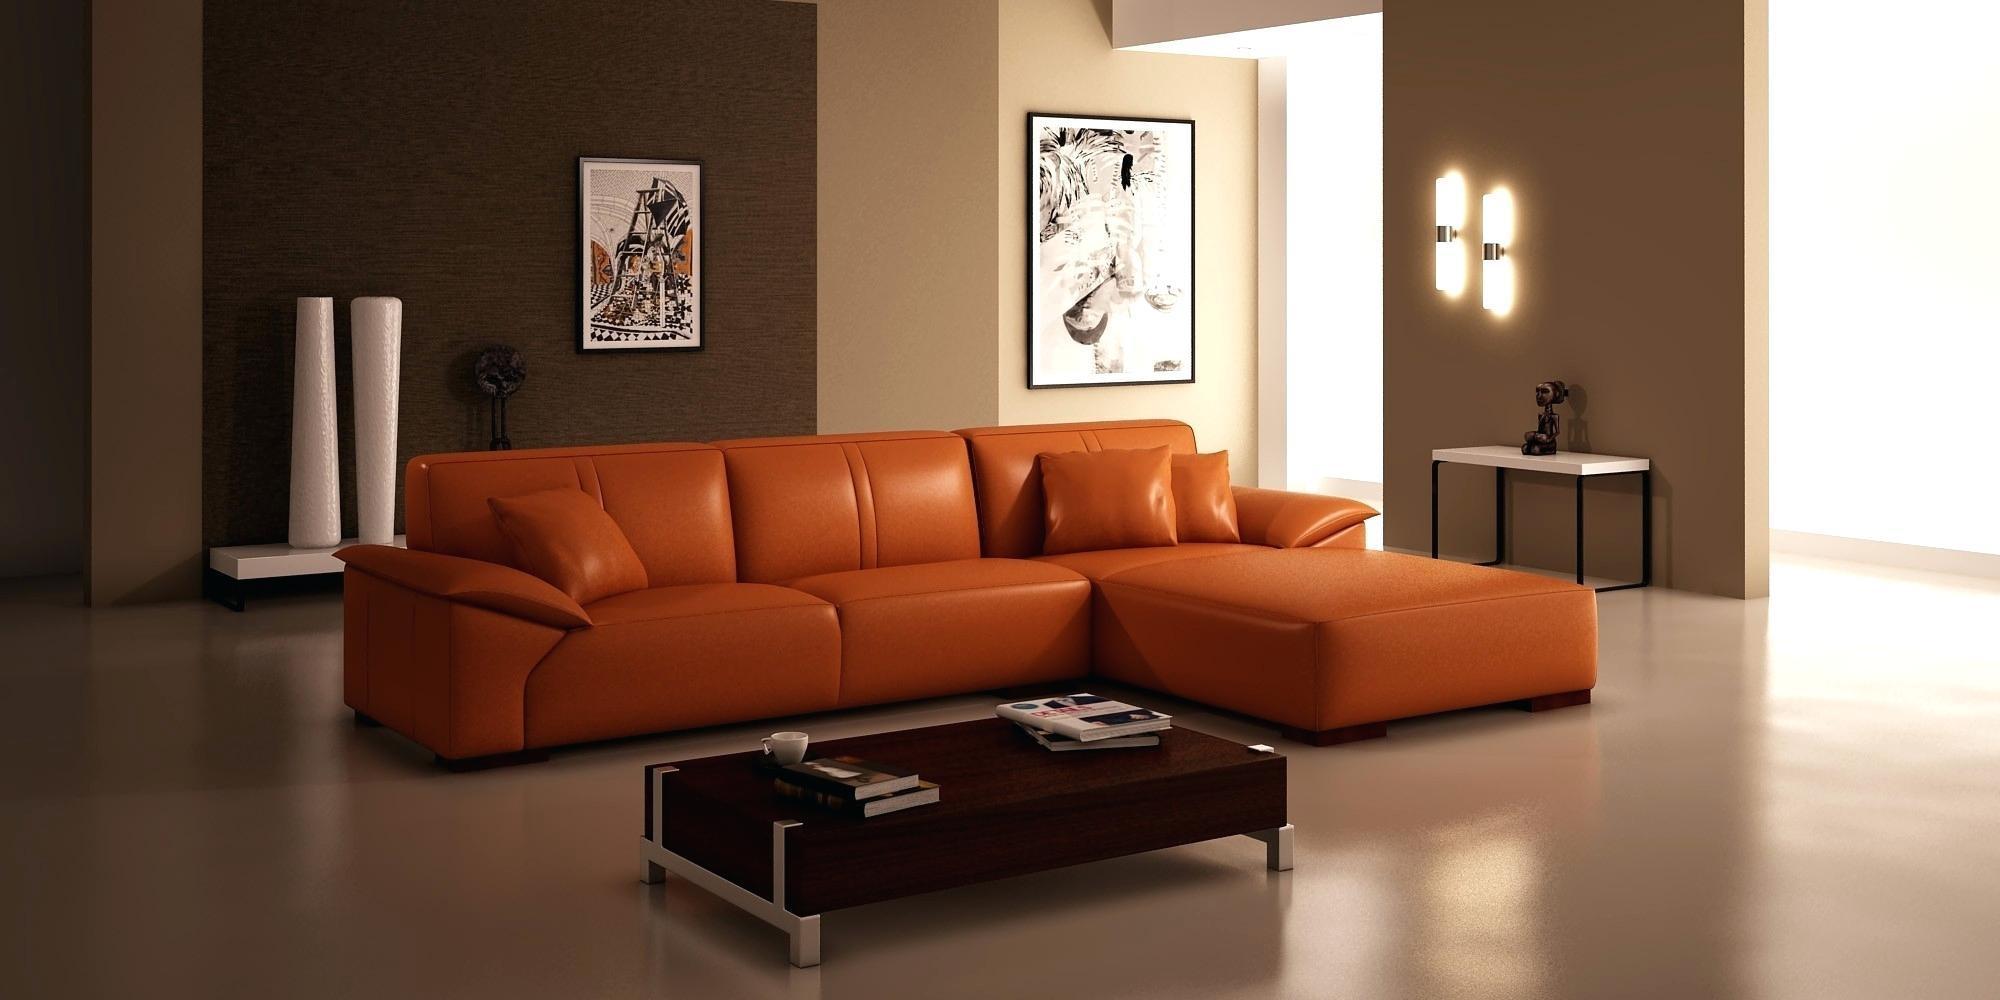 Sofas Center : Zed Orange Leather Sofa Burnt Sleeper Contemporary With Regard To Burnt Orange Leather Sofas (Image 20 of 20)